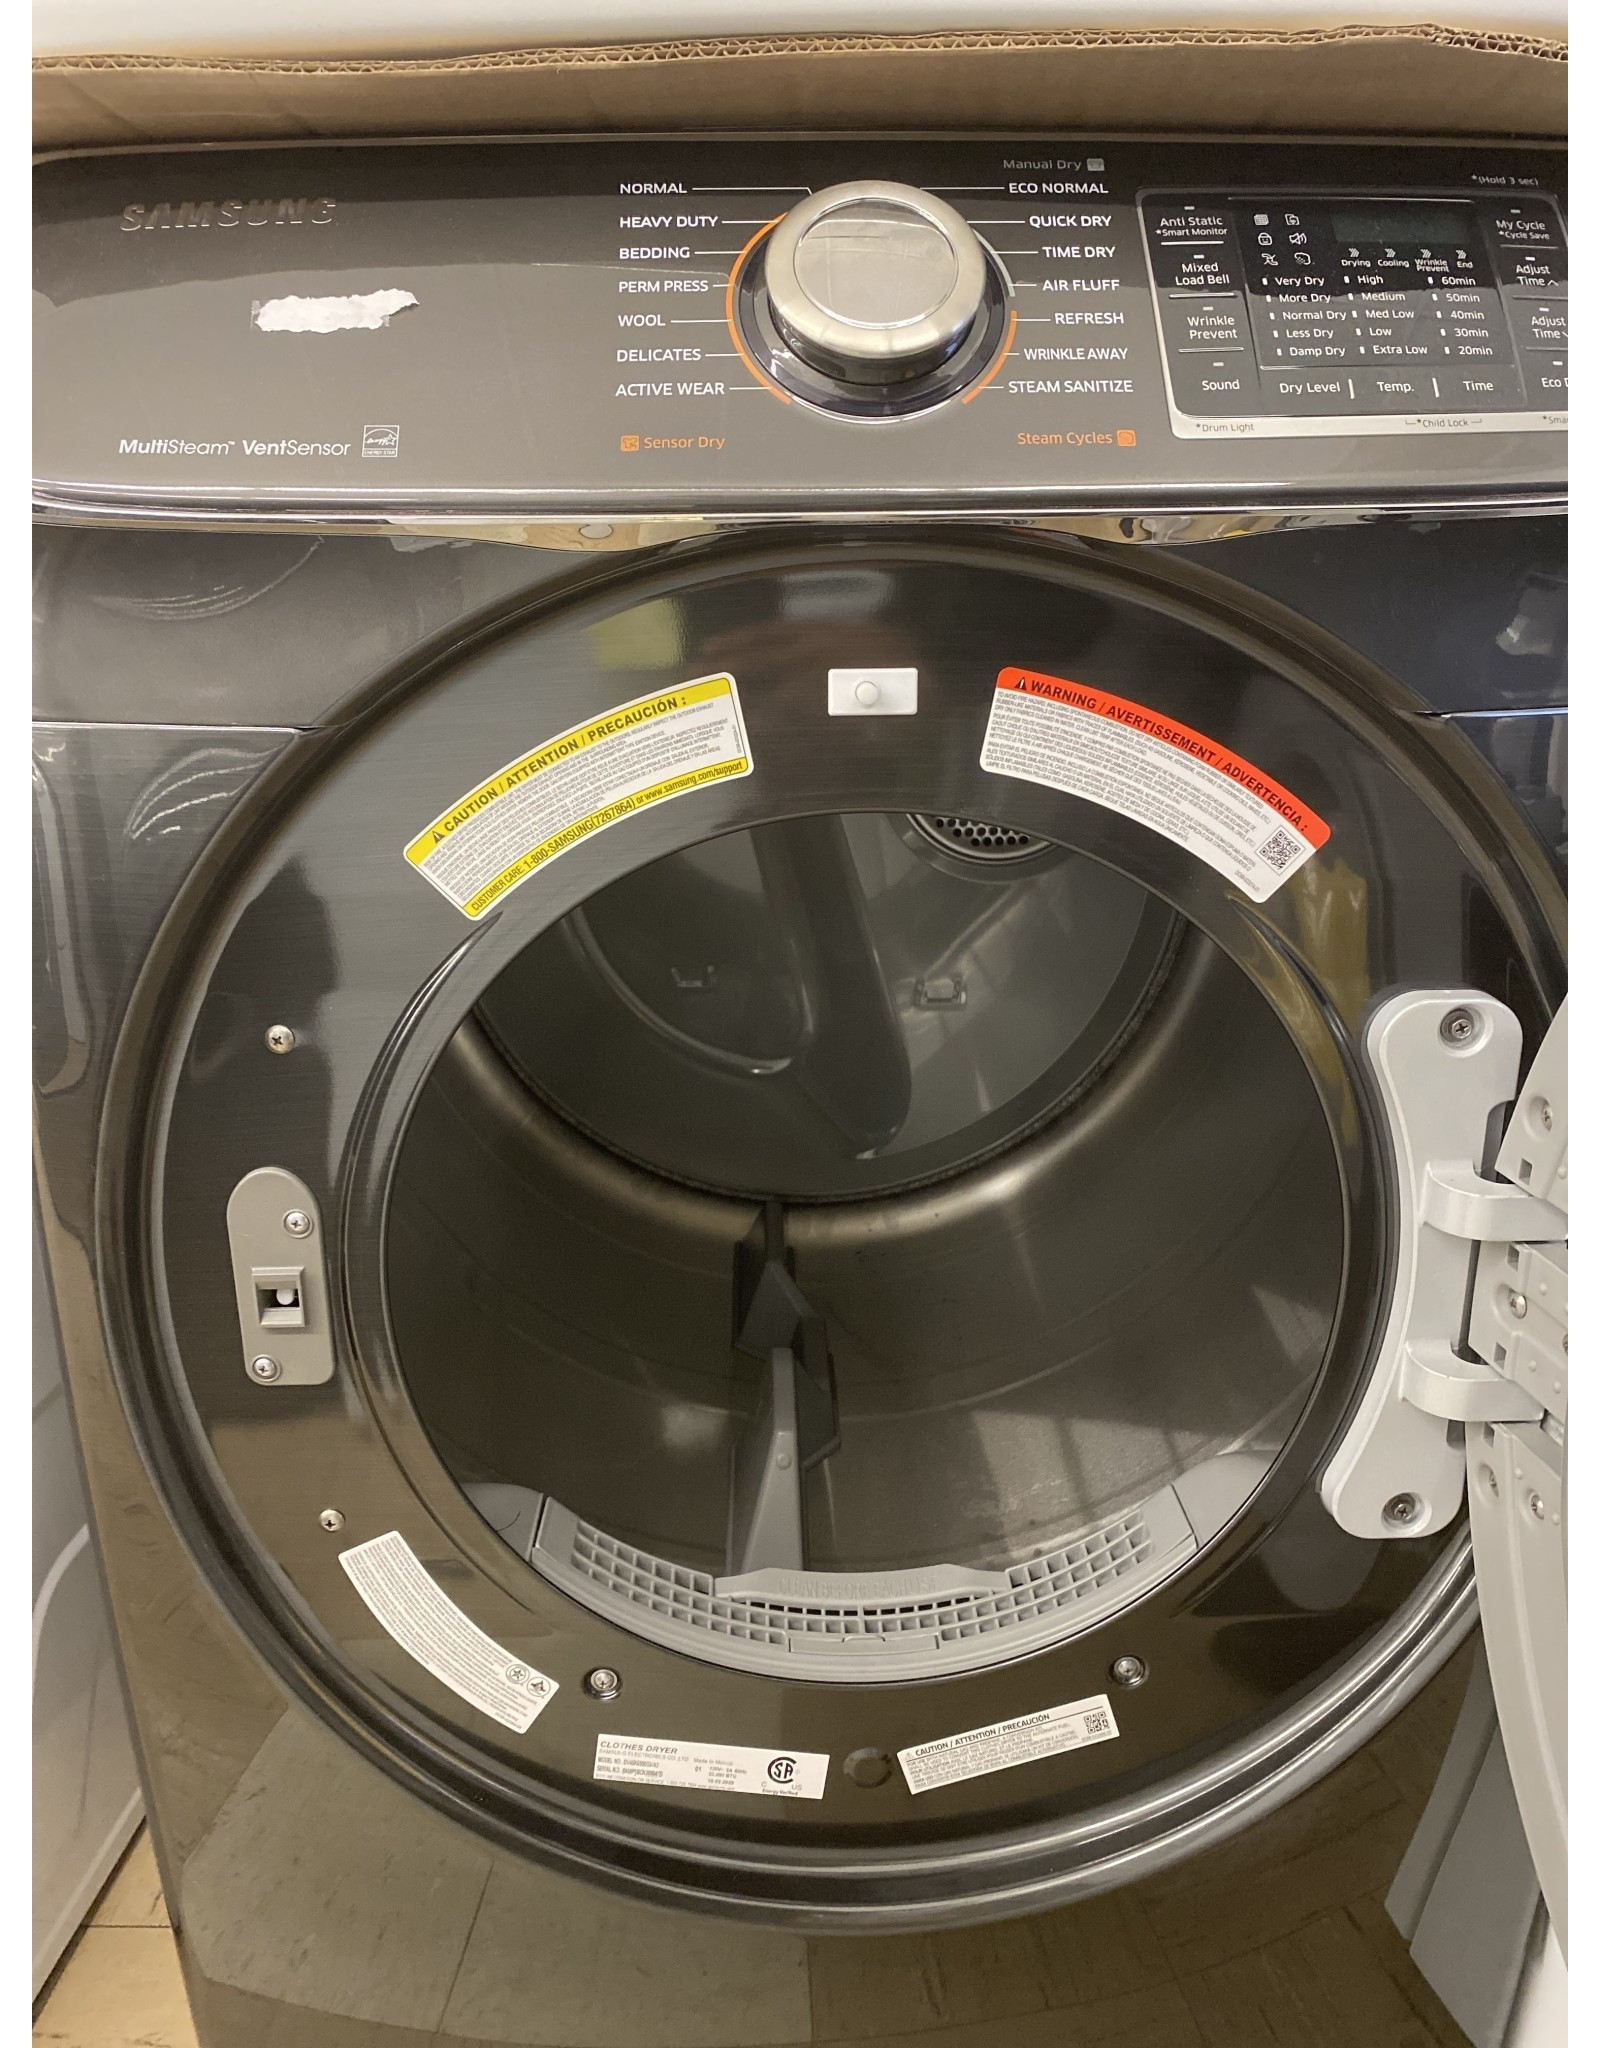 SAMSUNG DV45K6500GVA3 7.5 cu. ft. Gas Dryer with Steam in Black Stainless, ENERGY STAR